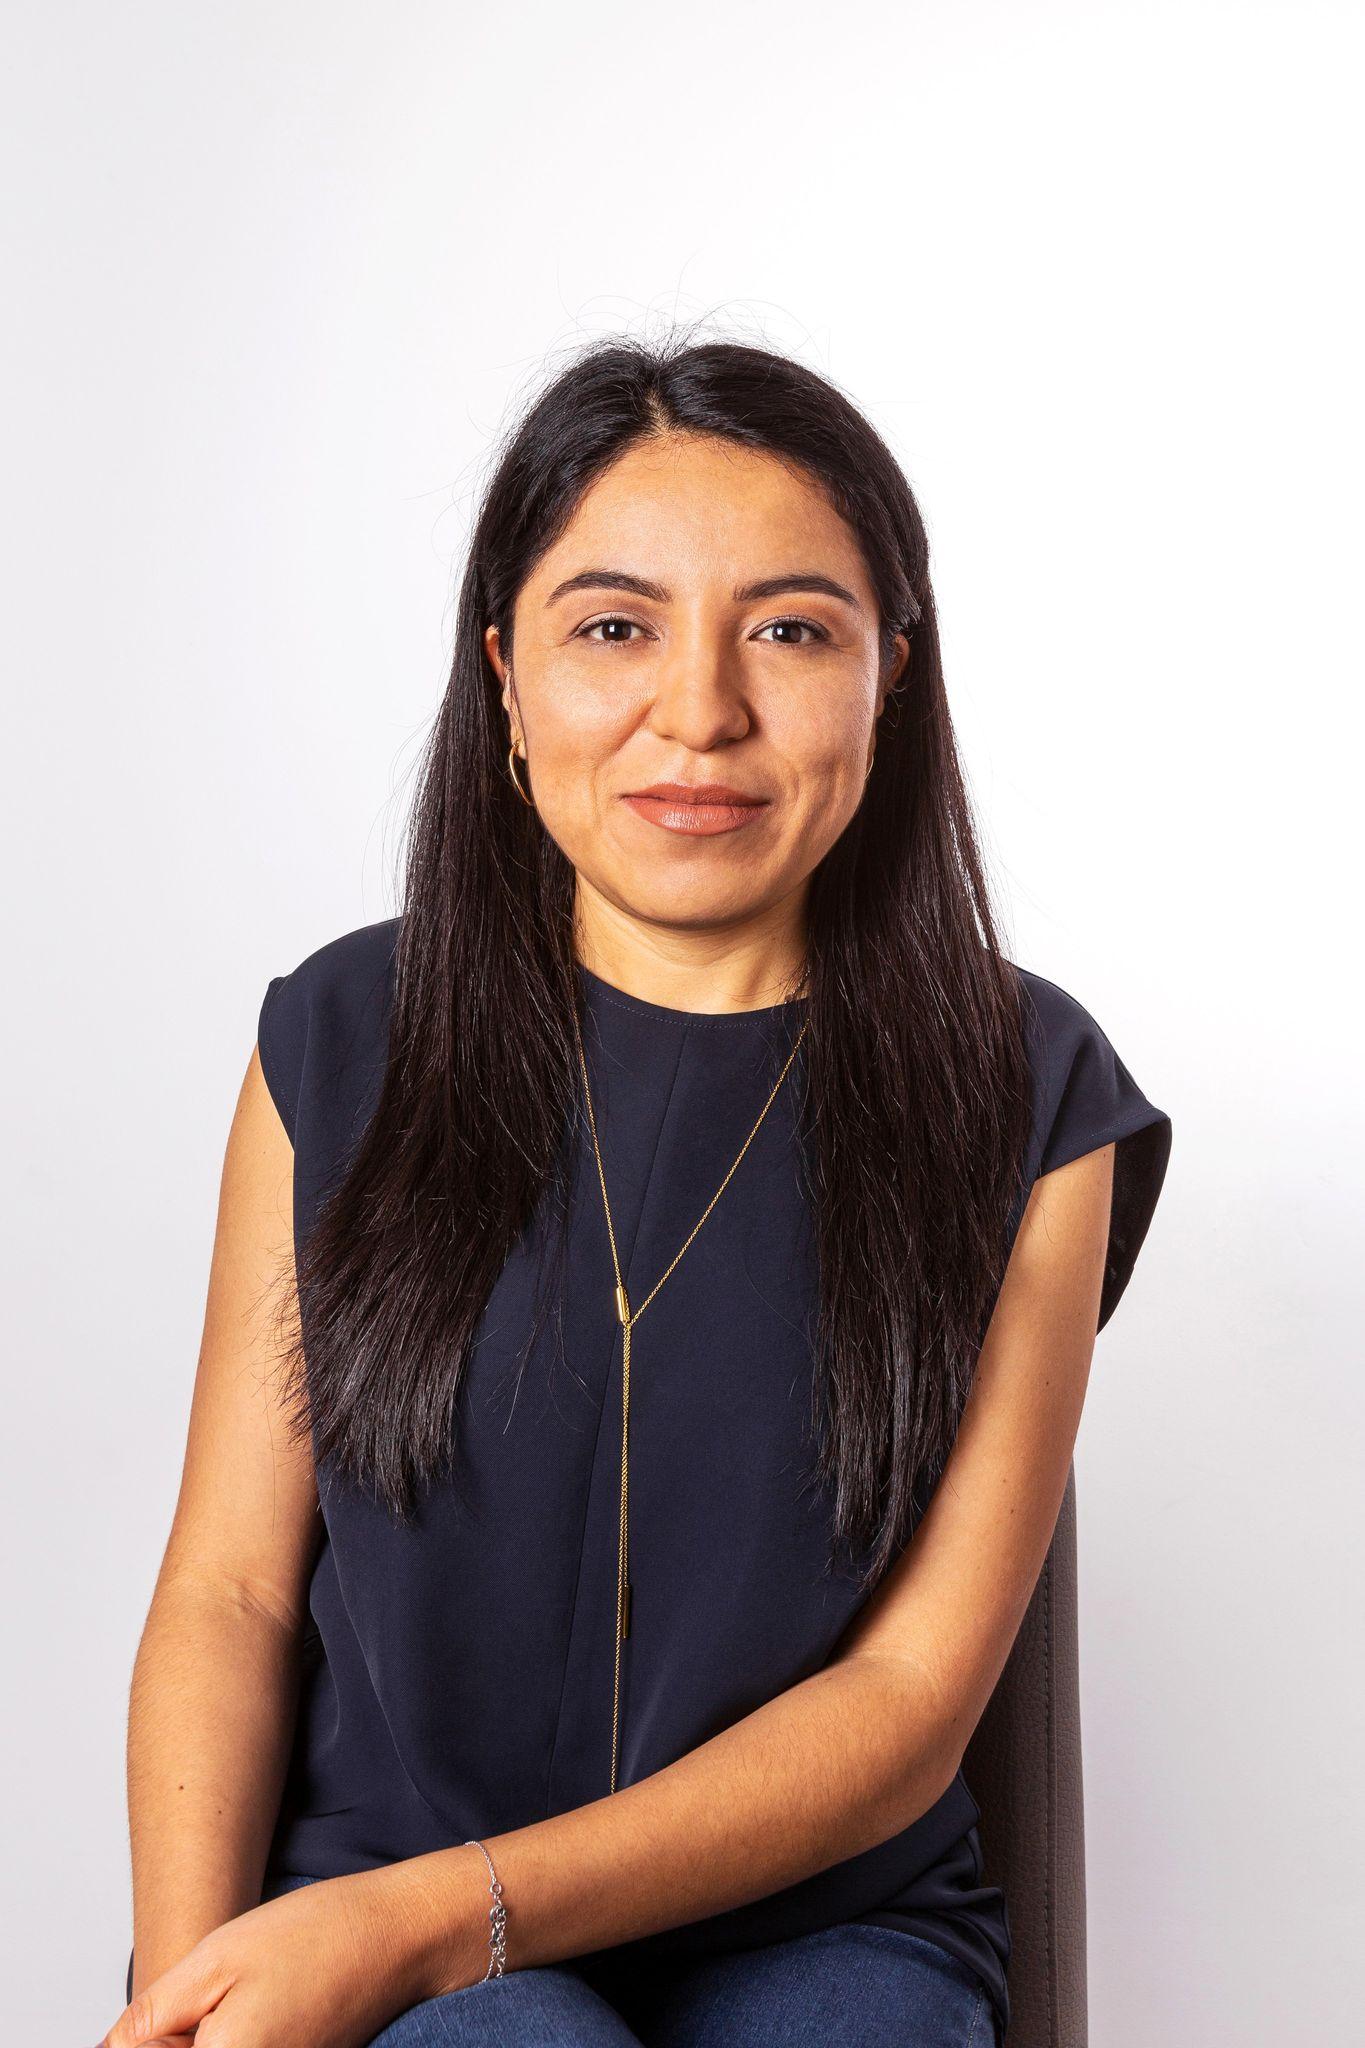 Gabriela L. Pérez Acevedo